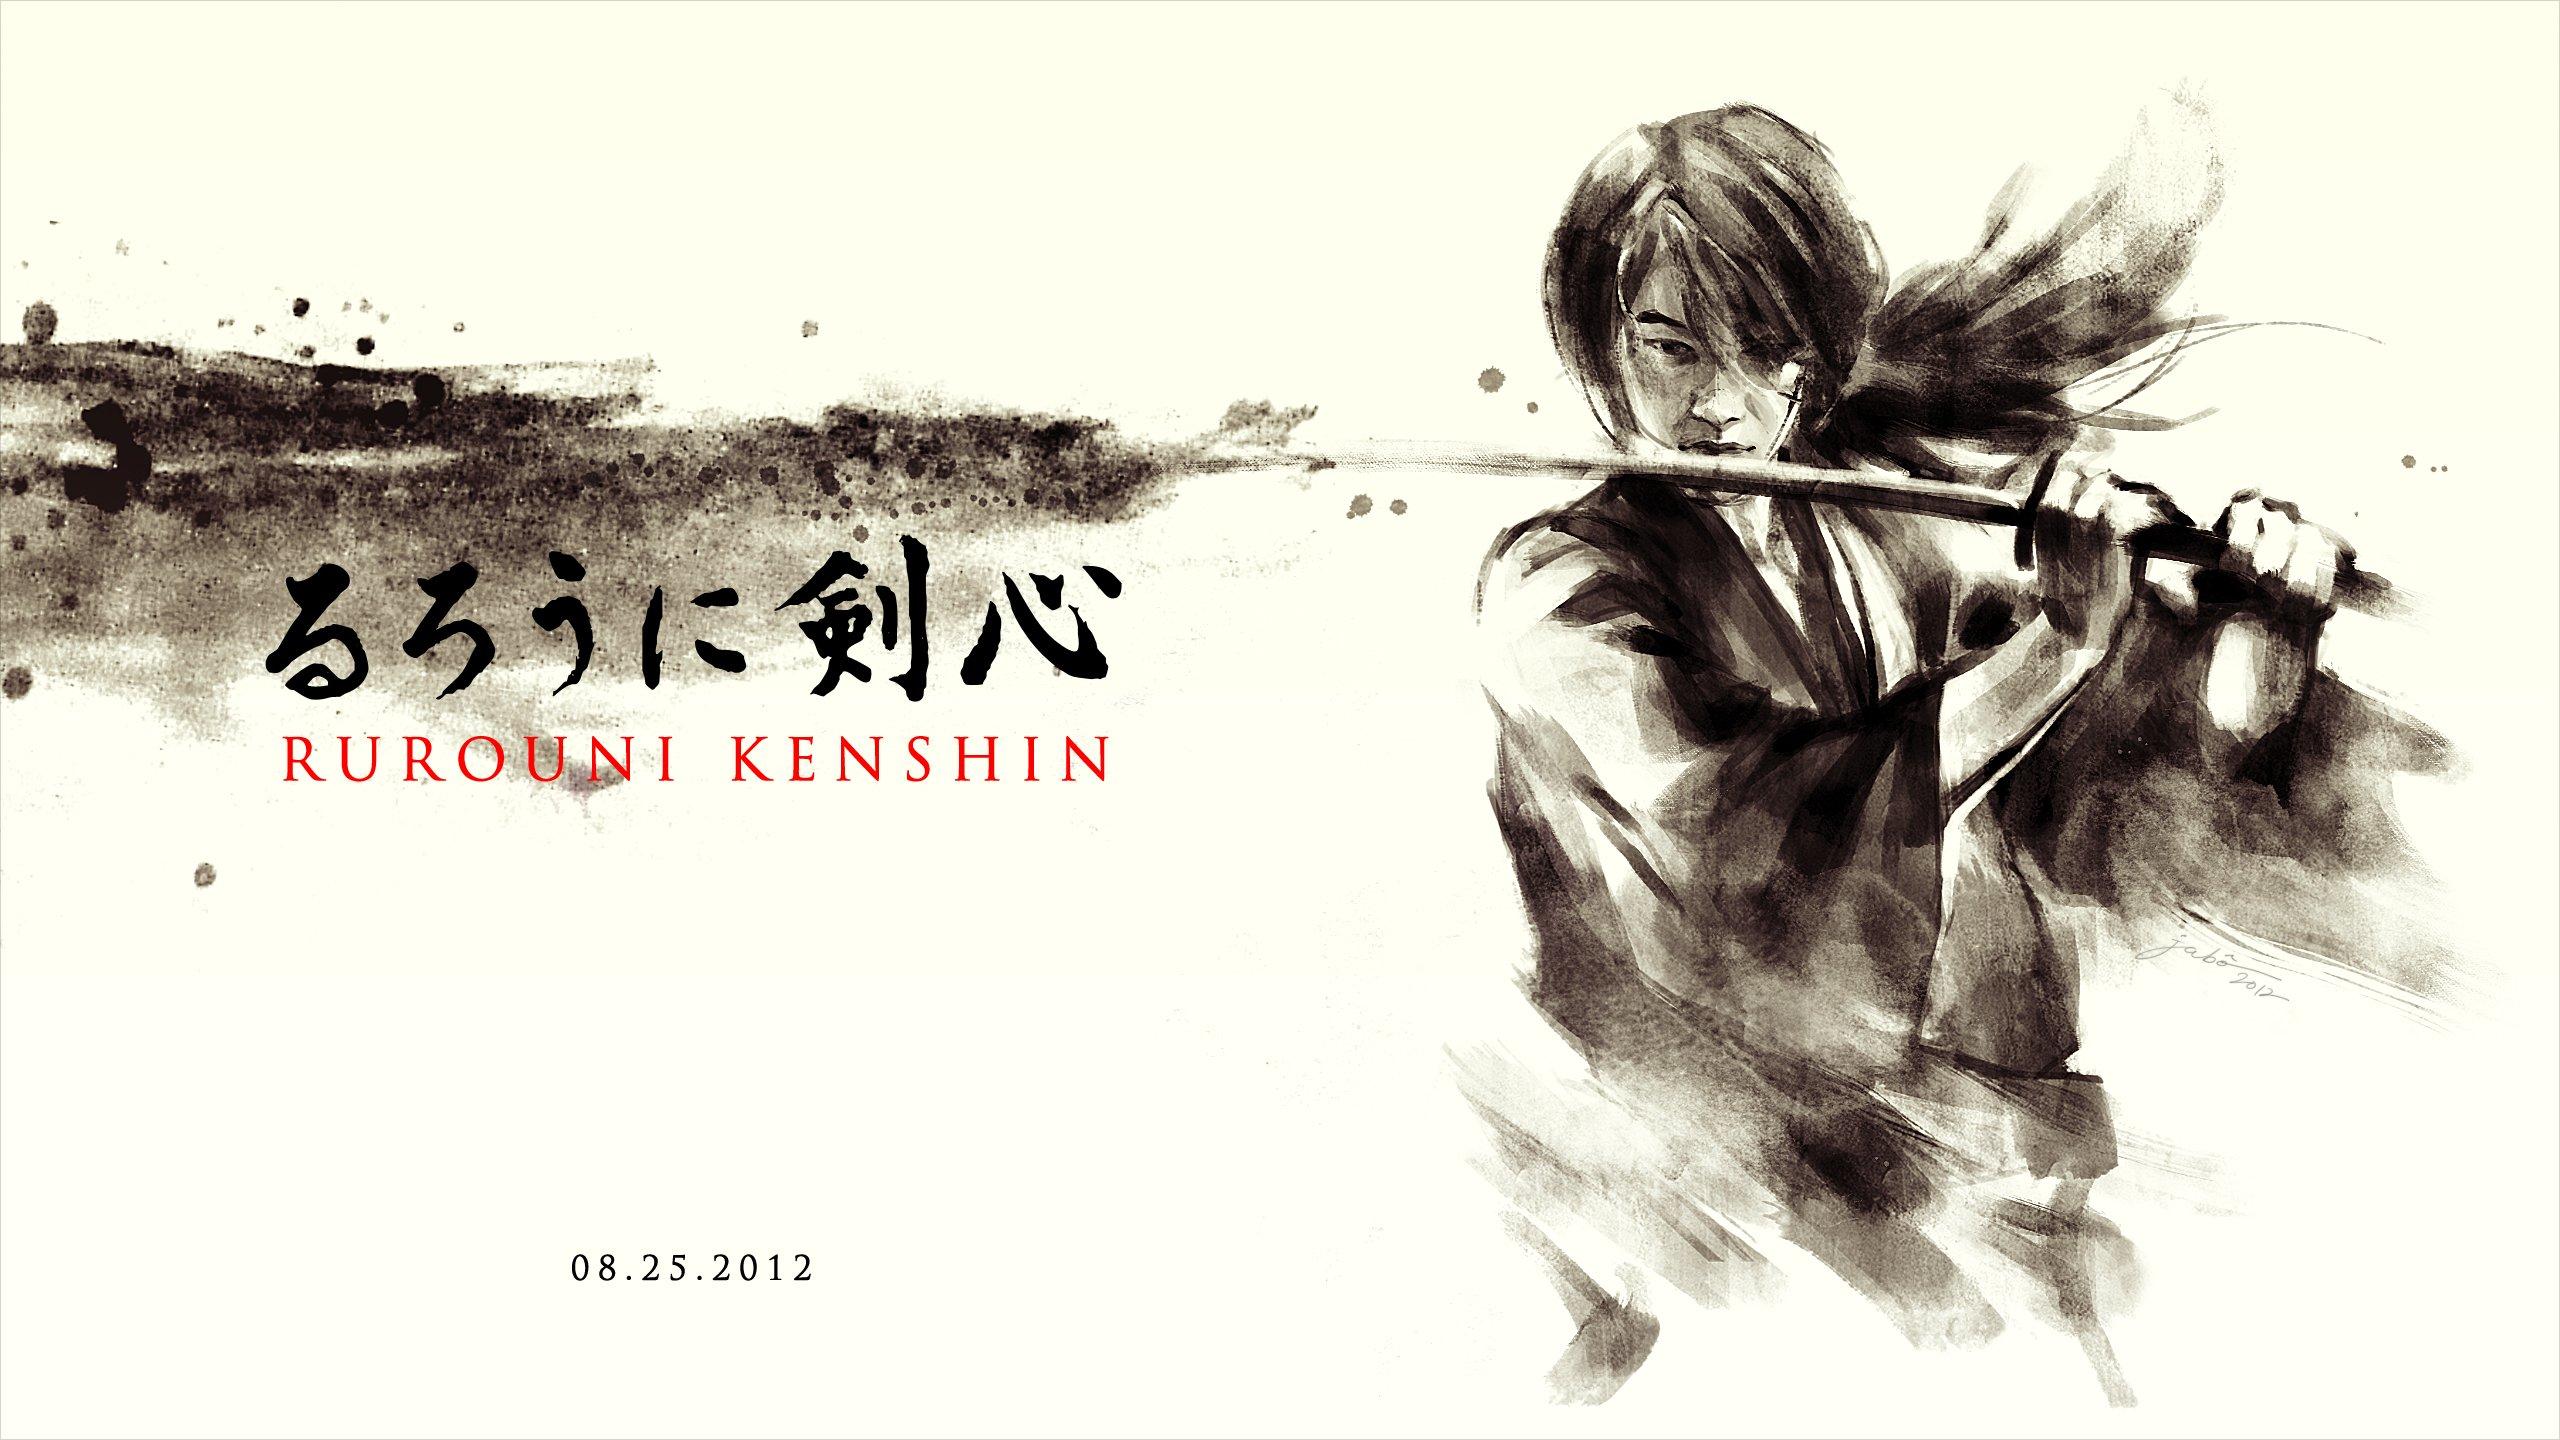 Drawn samurai desktop background Kenshin fantasy japanese 2560x1440 action